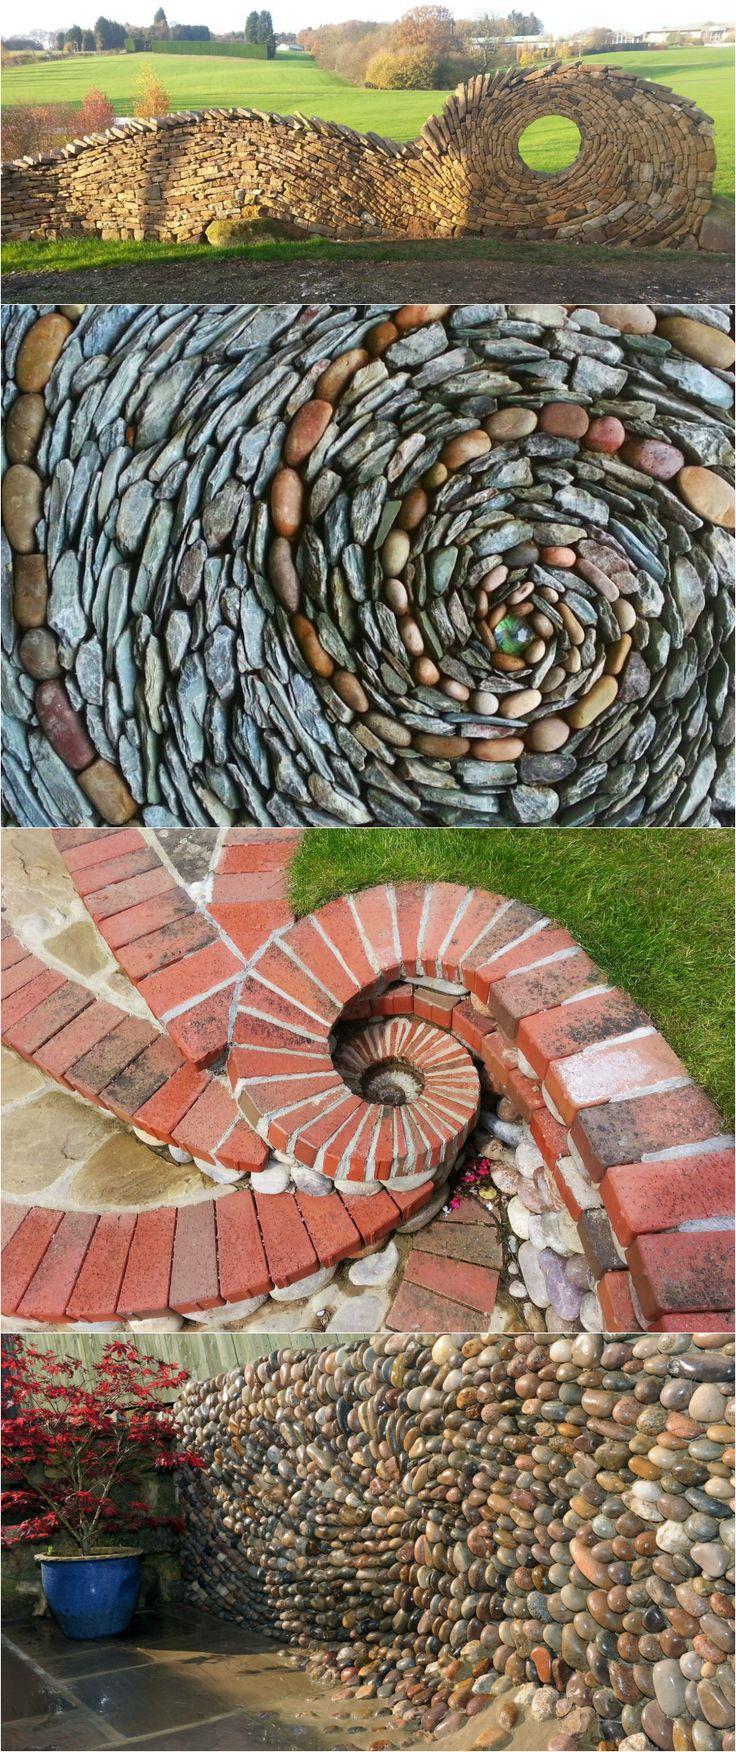 English stonemason Johnny Clasper creates mesmerizing hand-built walls, mosaics and sculptural landscapes that transform stone into a flowing, fluid-like medium.